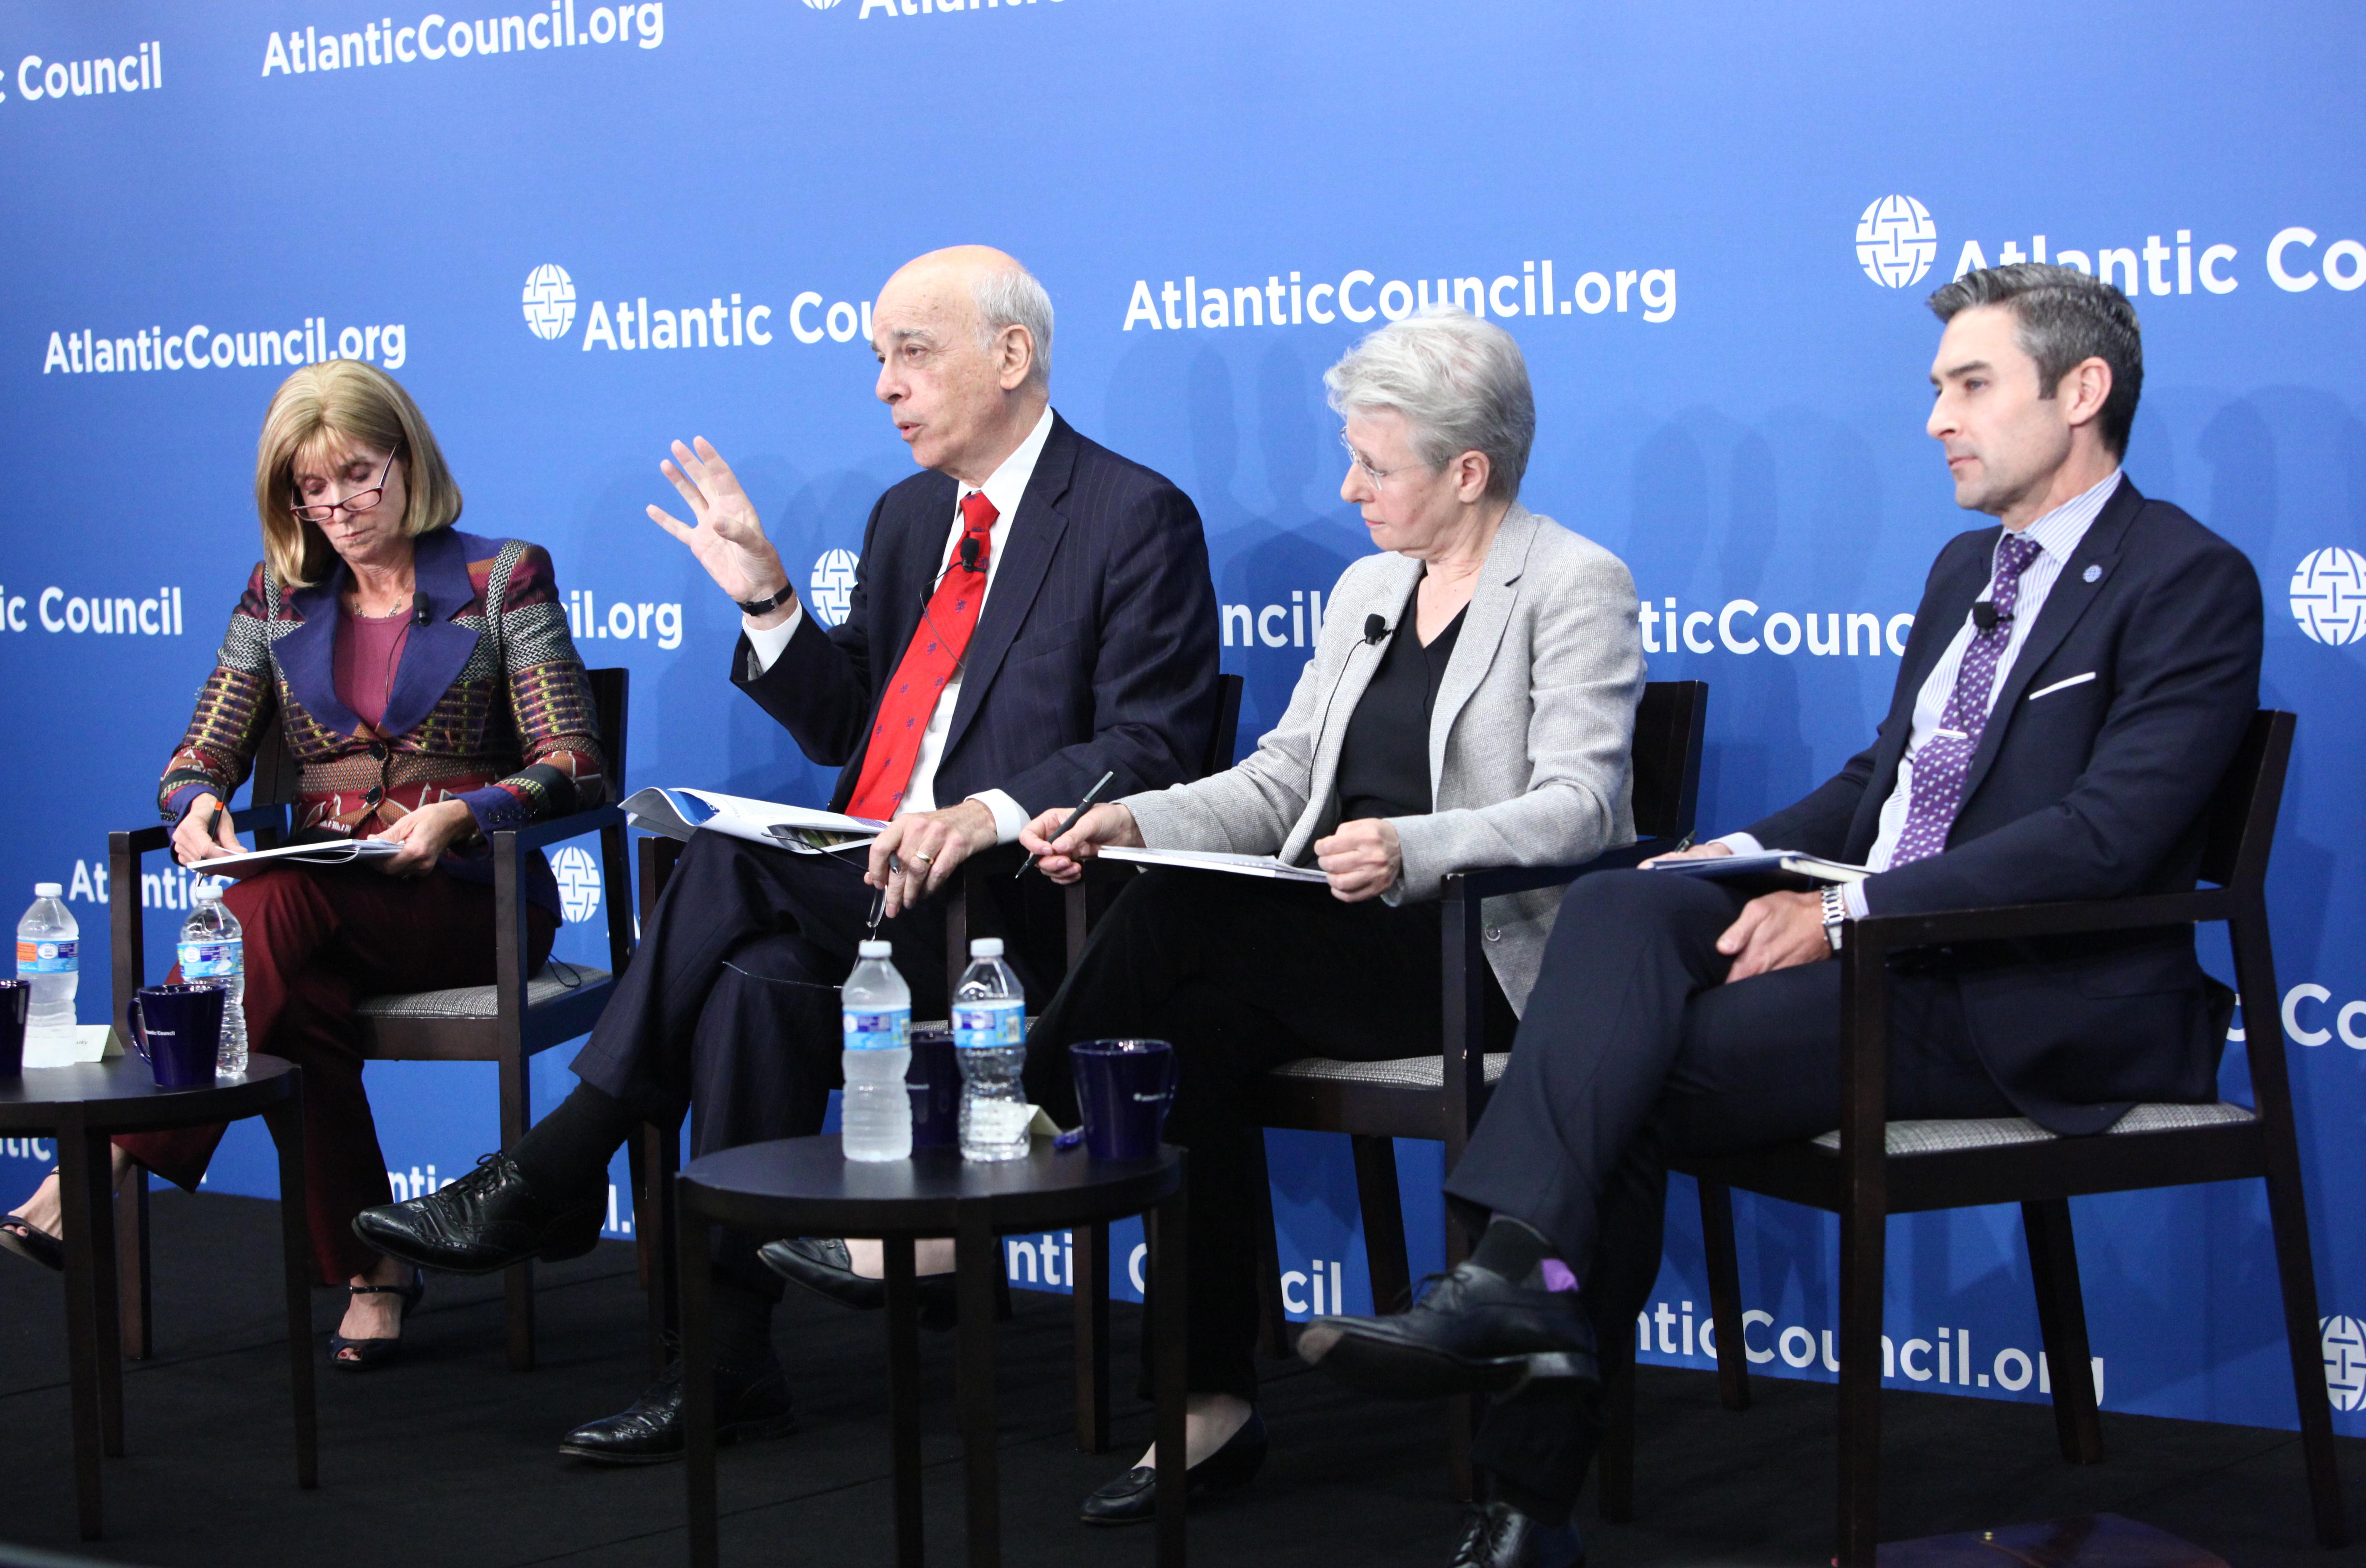 NATO Enlargement Seen About Filling Gaps